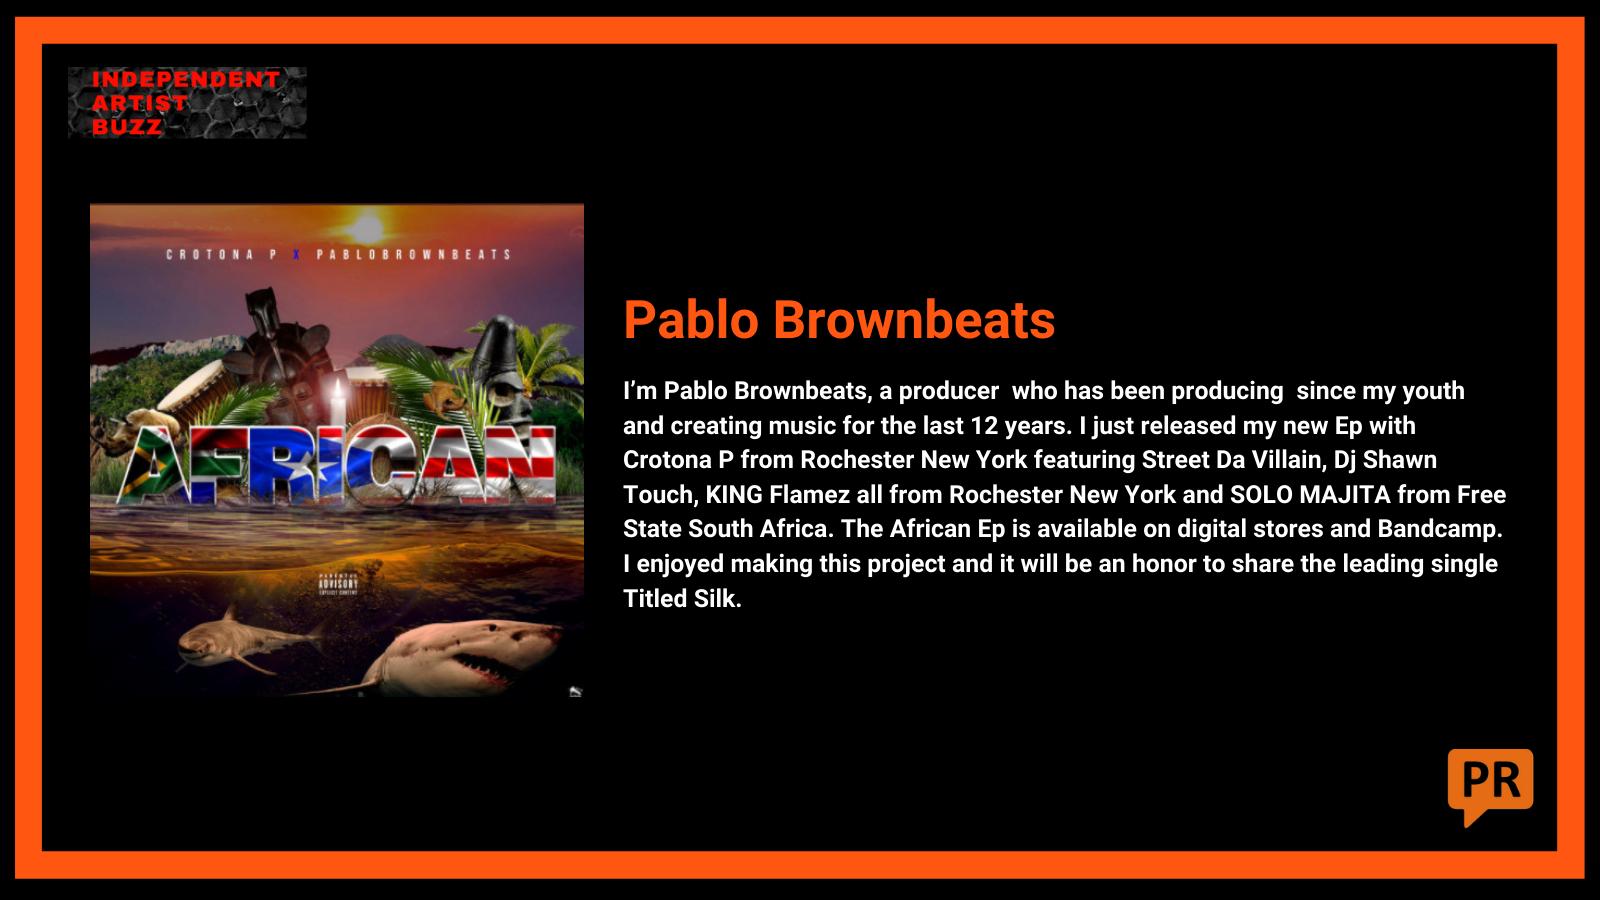 Pablo Brownbeats